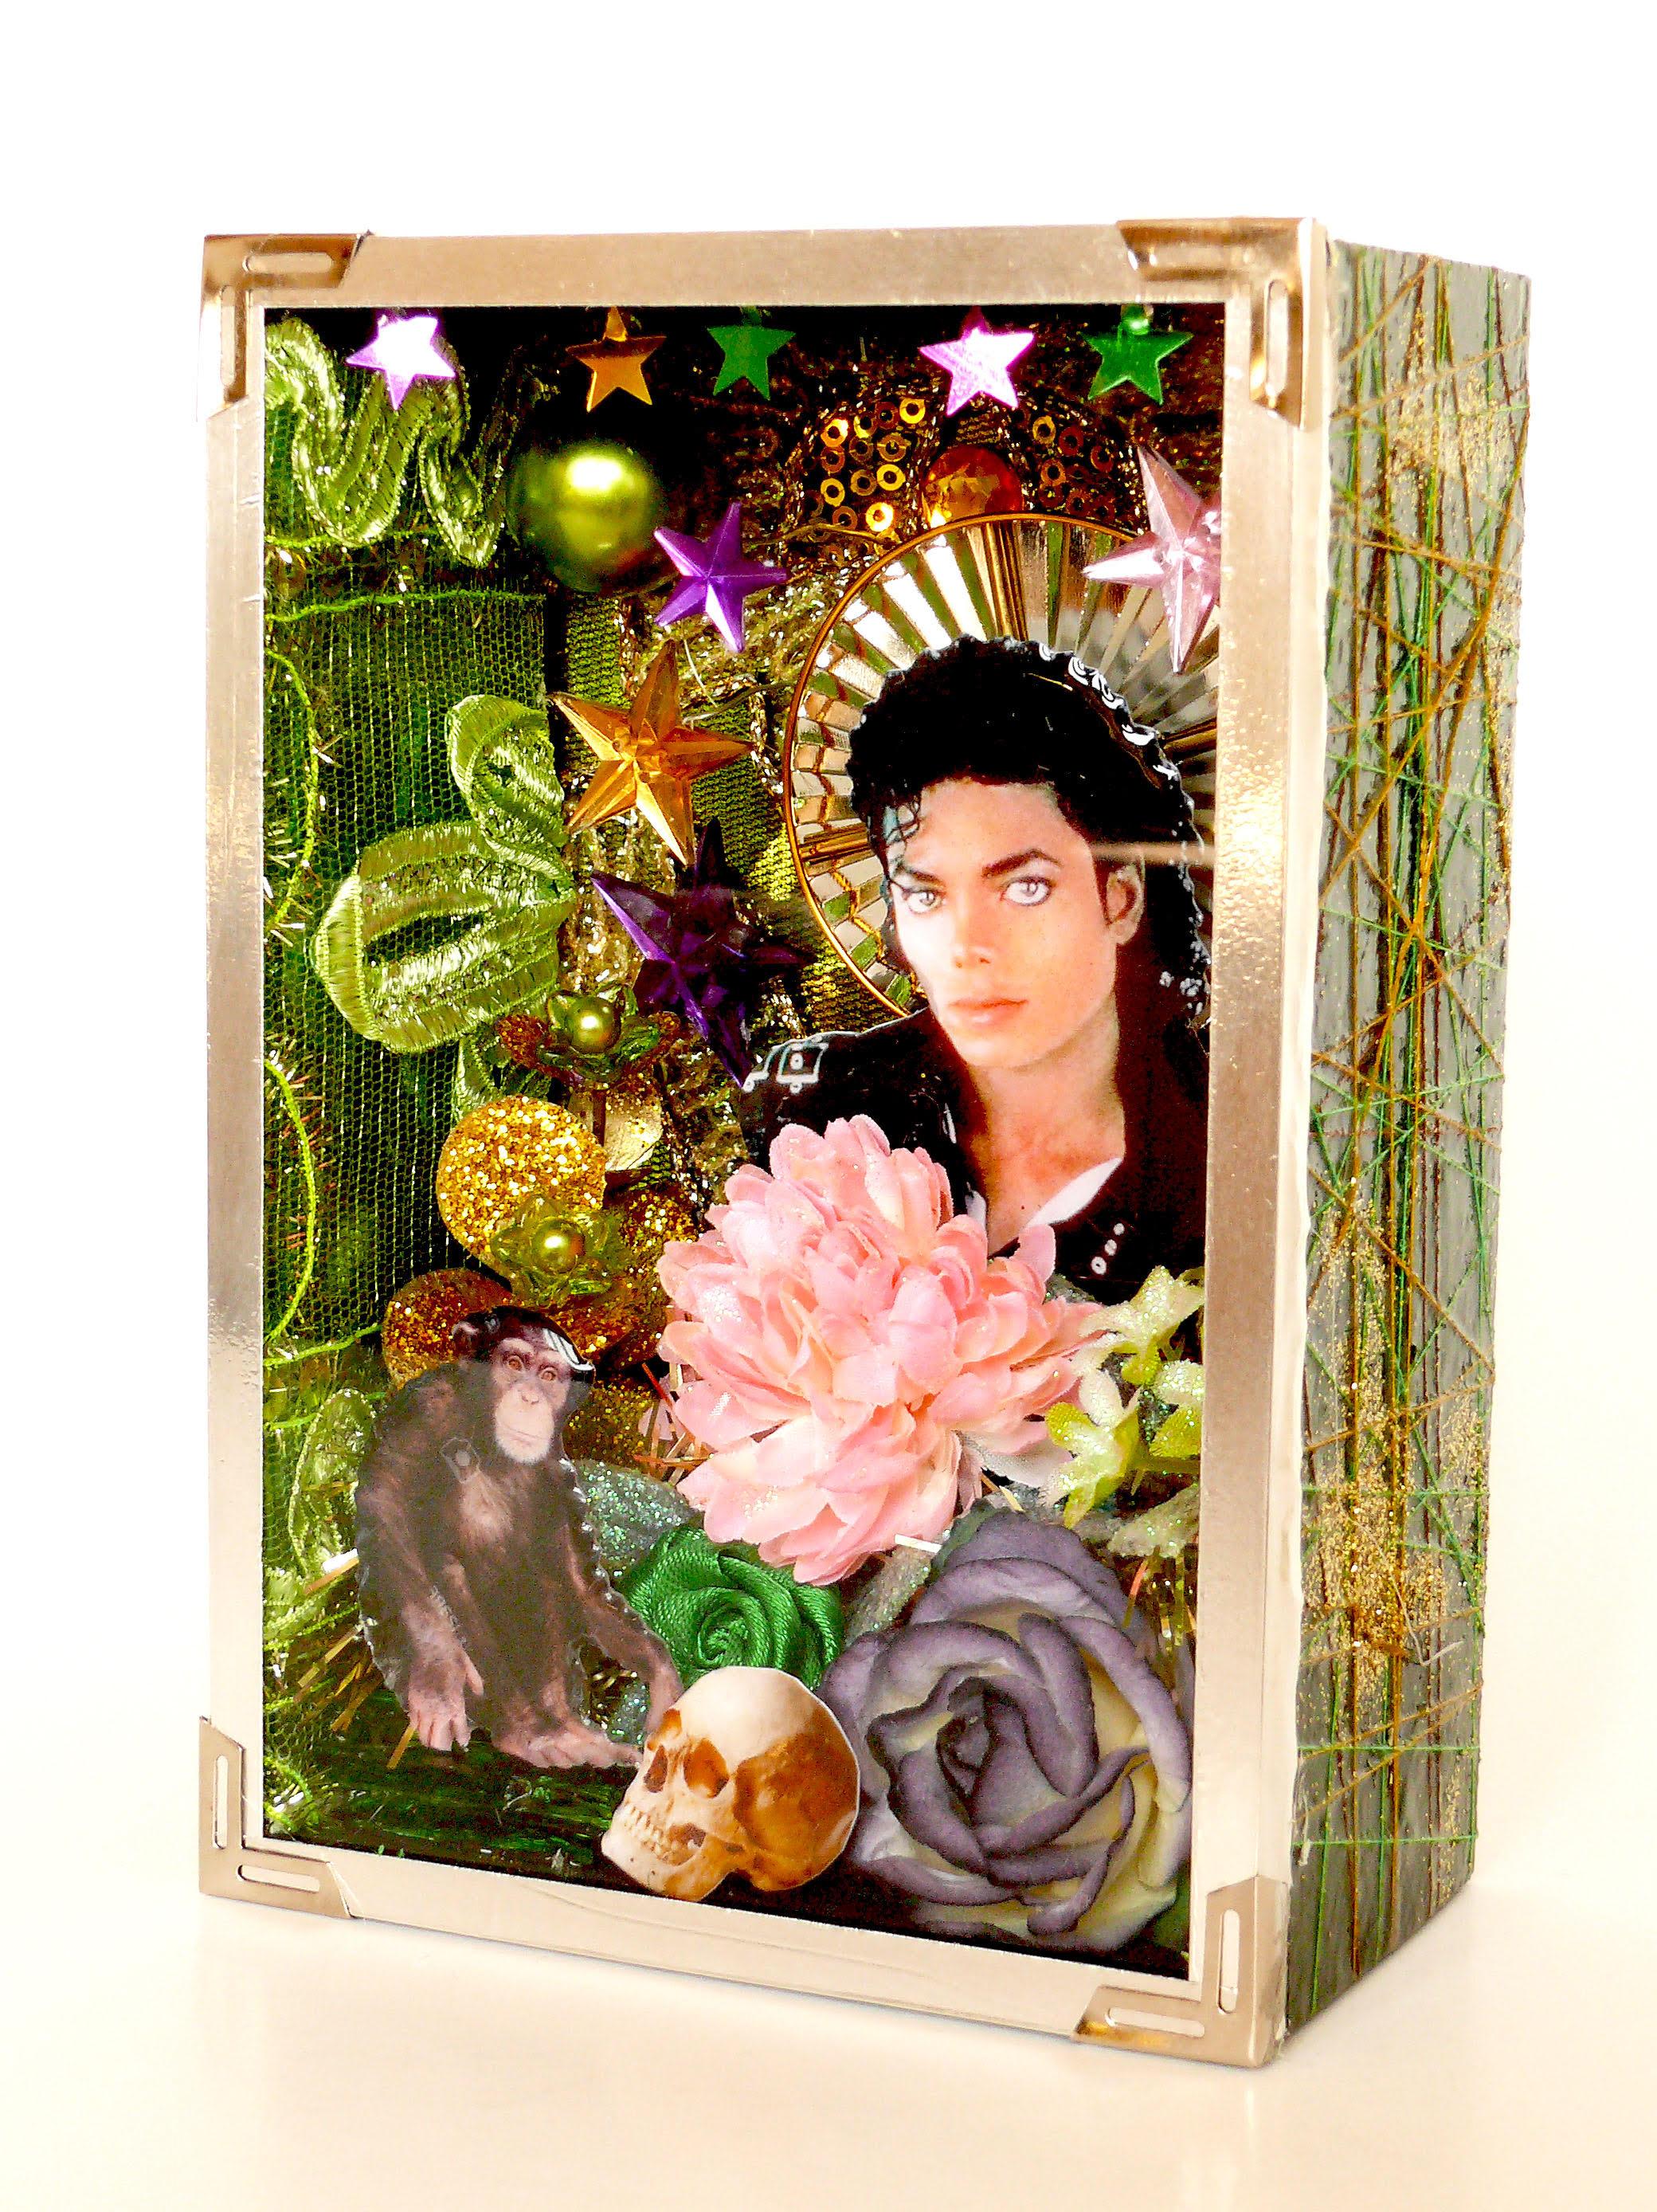 Michael Jackson Animatheca.jpg